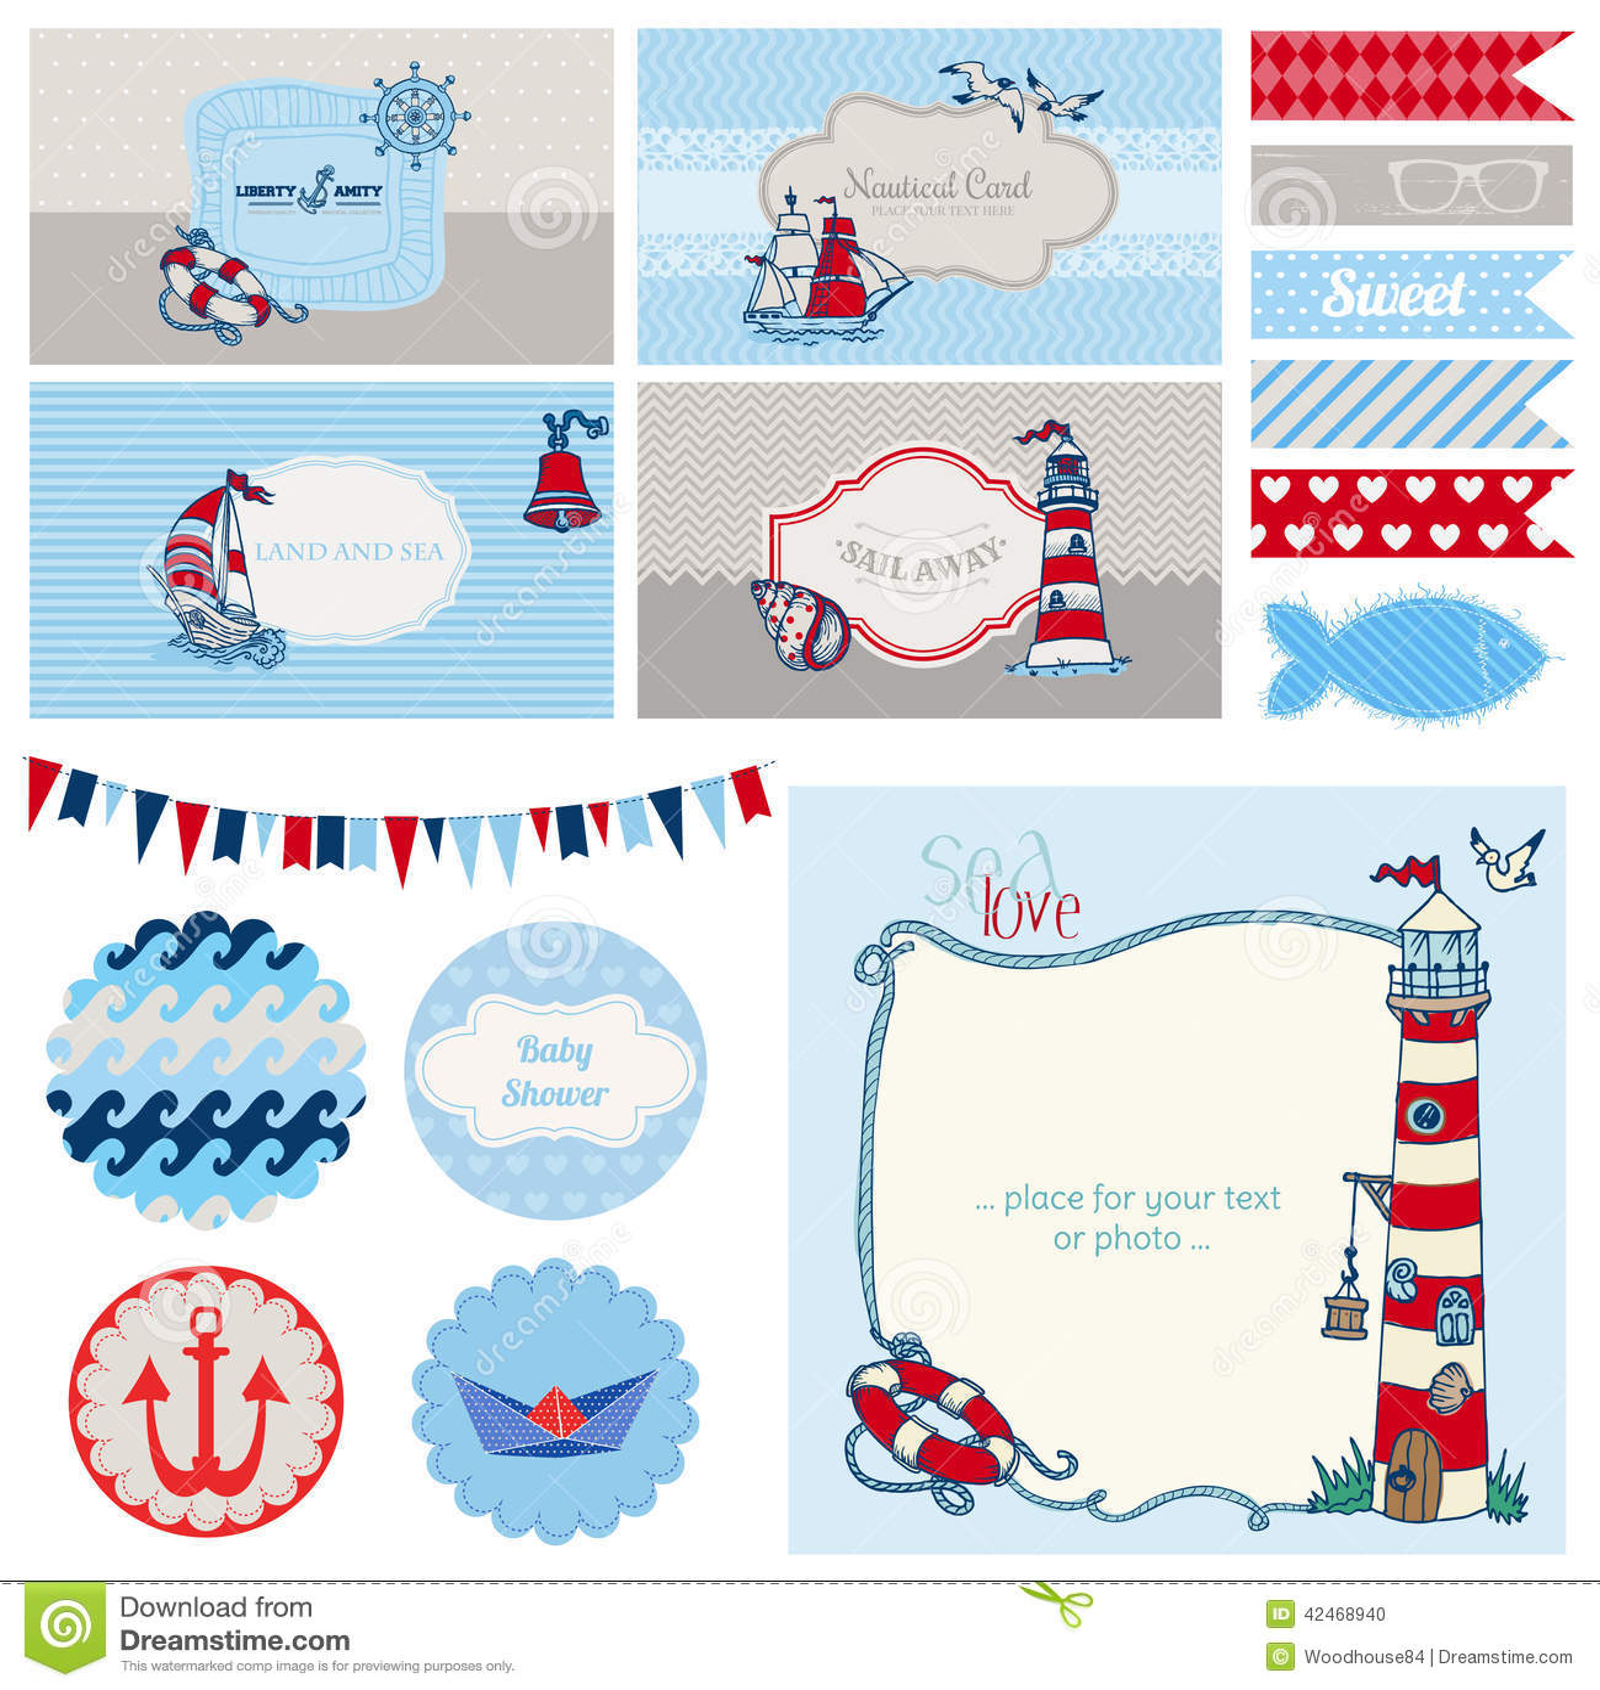 Nautical Theme Baby Shower Invitations with amazing invitation sample